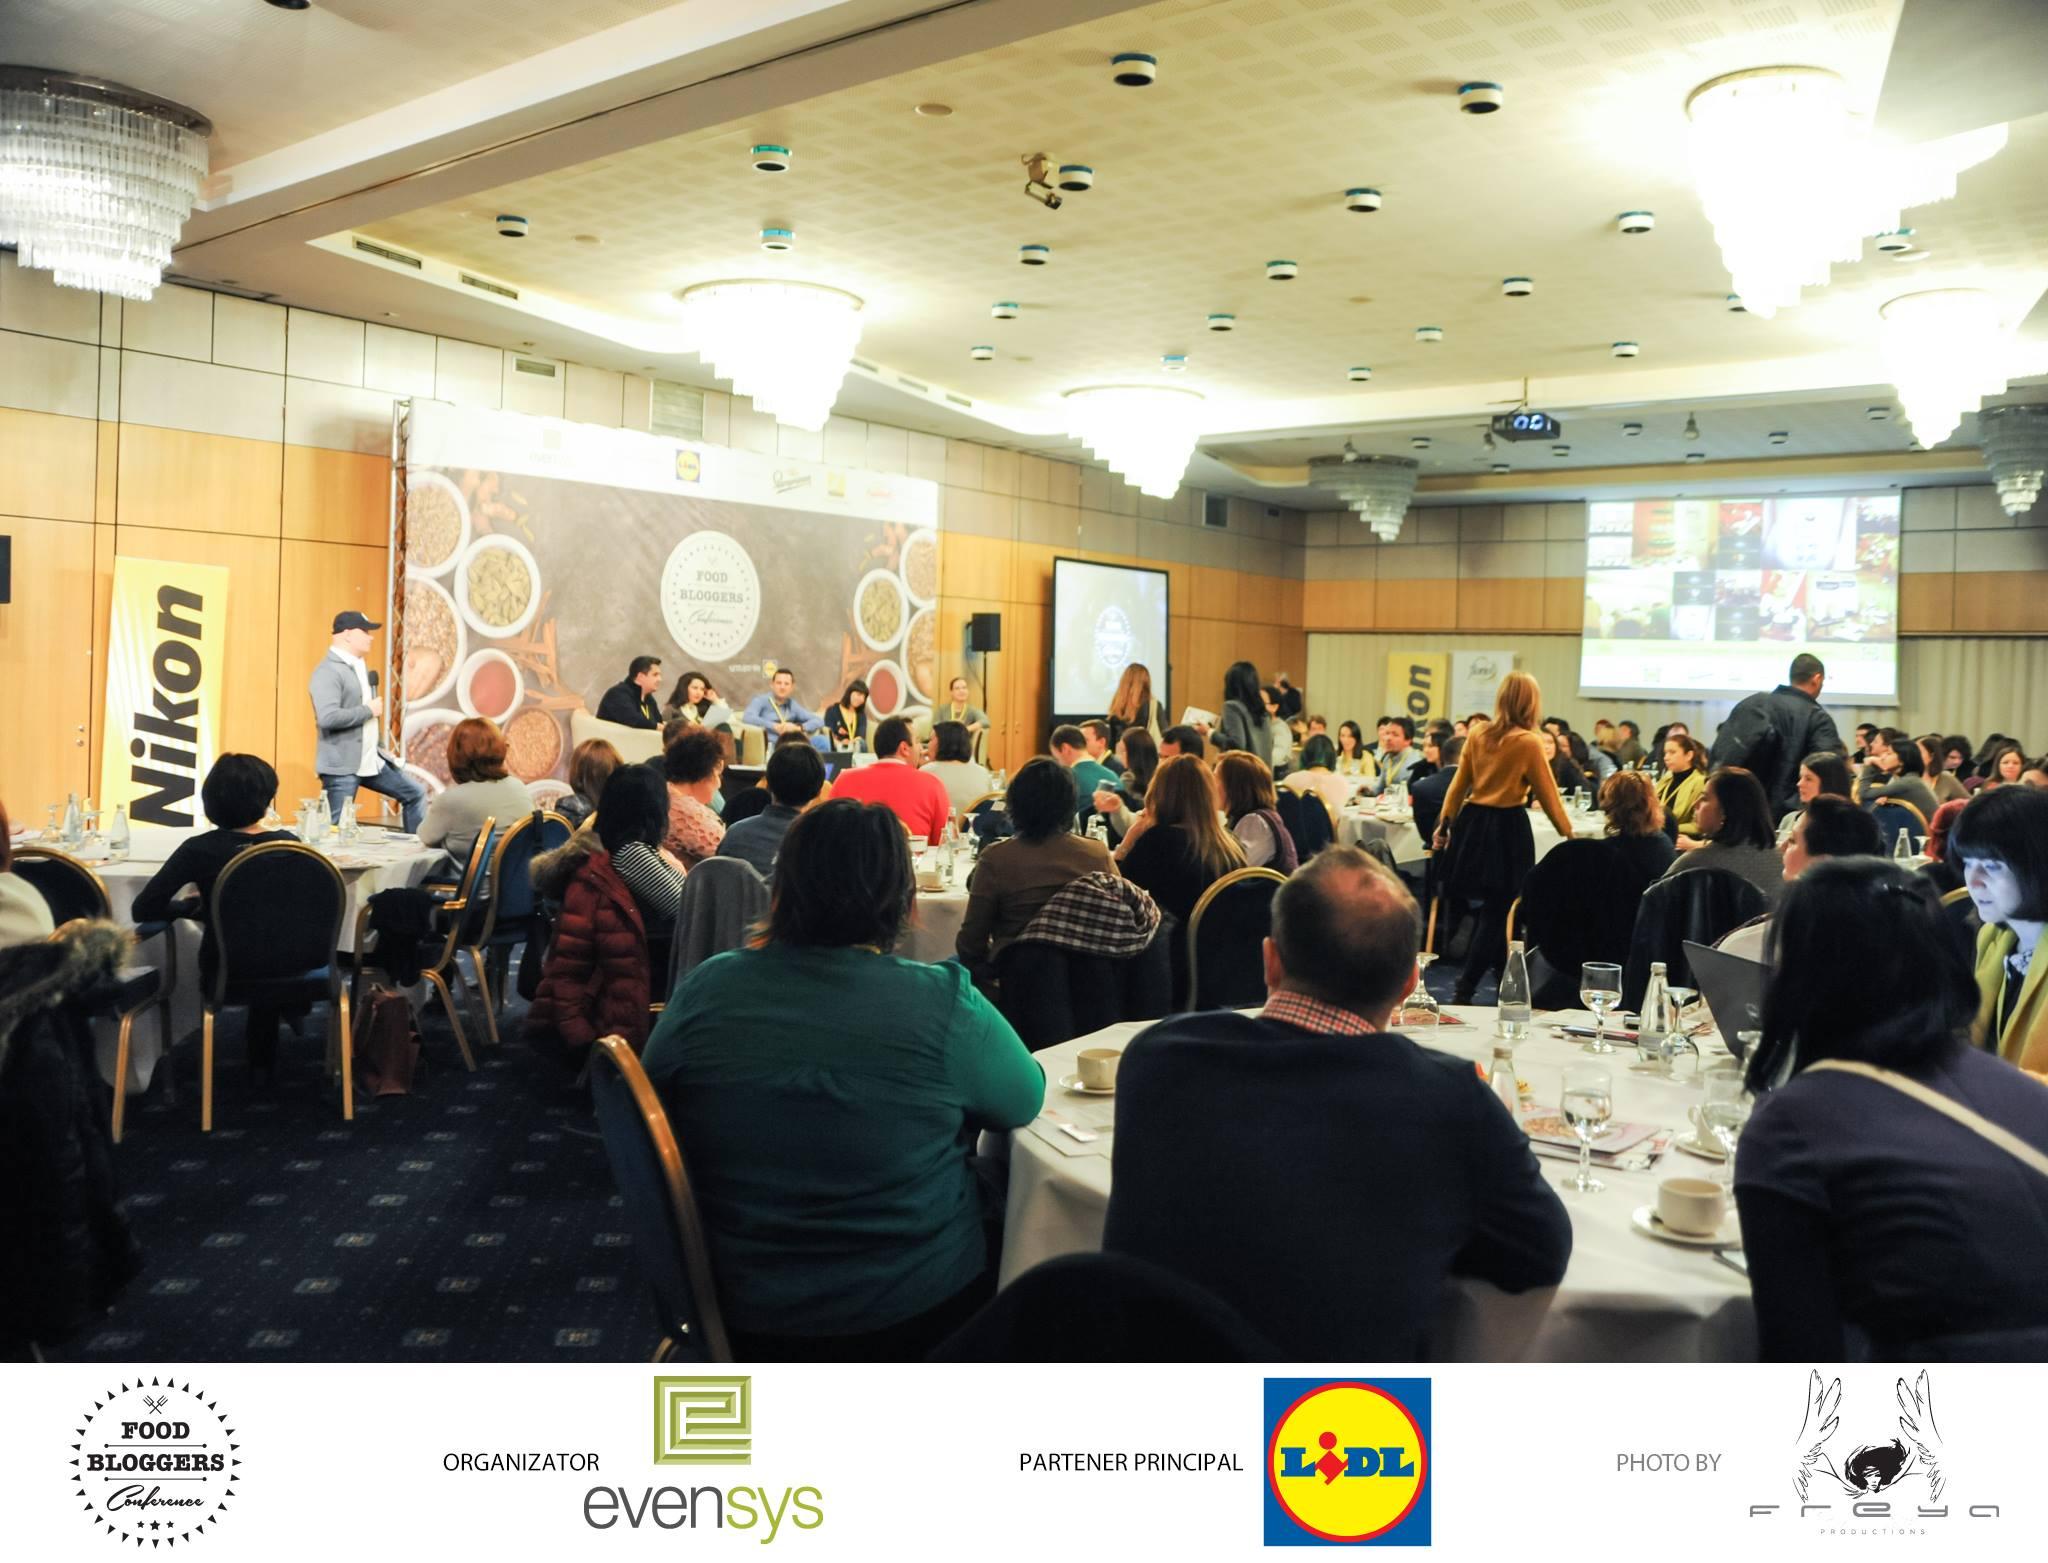 Preparare Food Bloggers Conference 2014, așa cum s-a văzut prin ochii mei 3